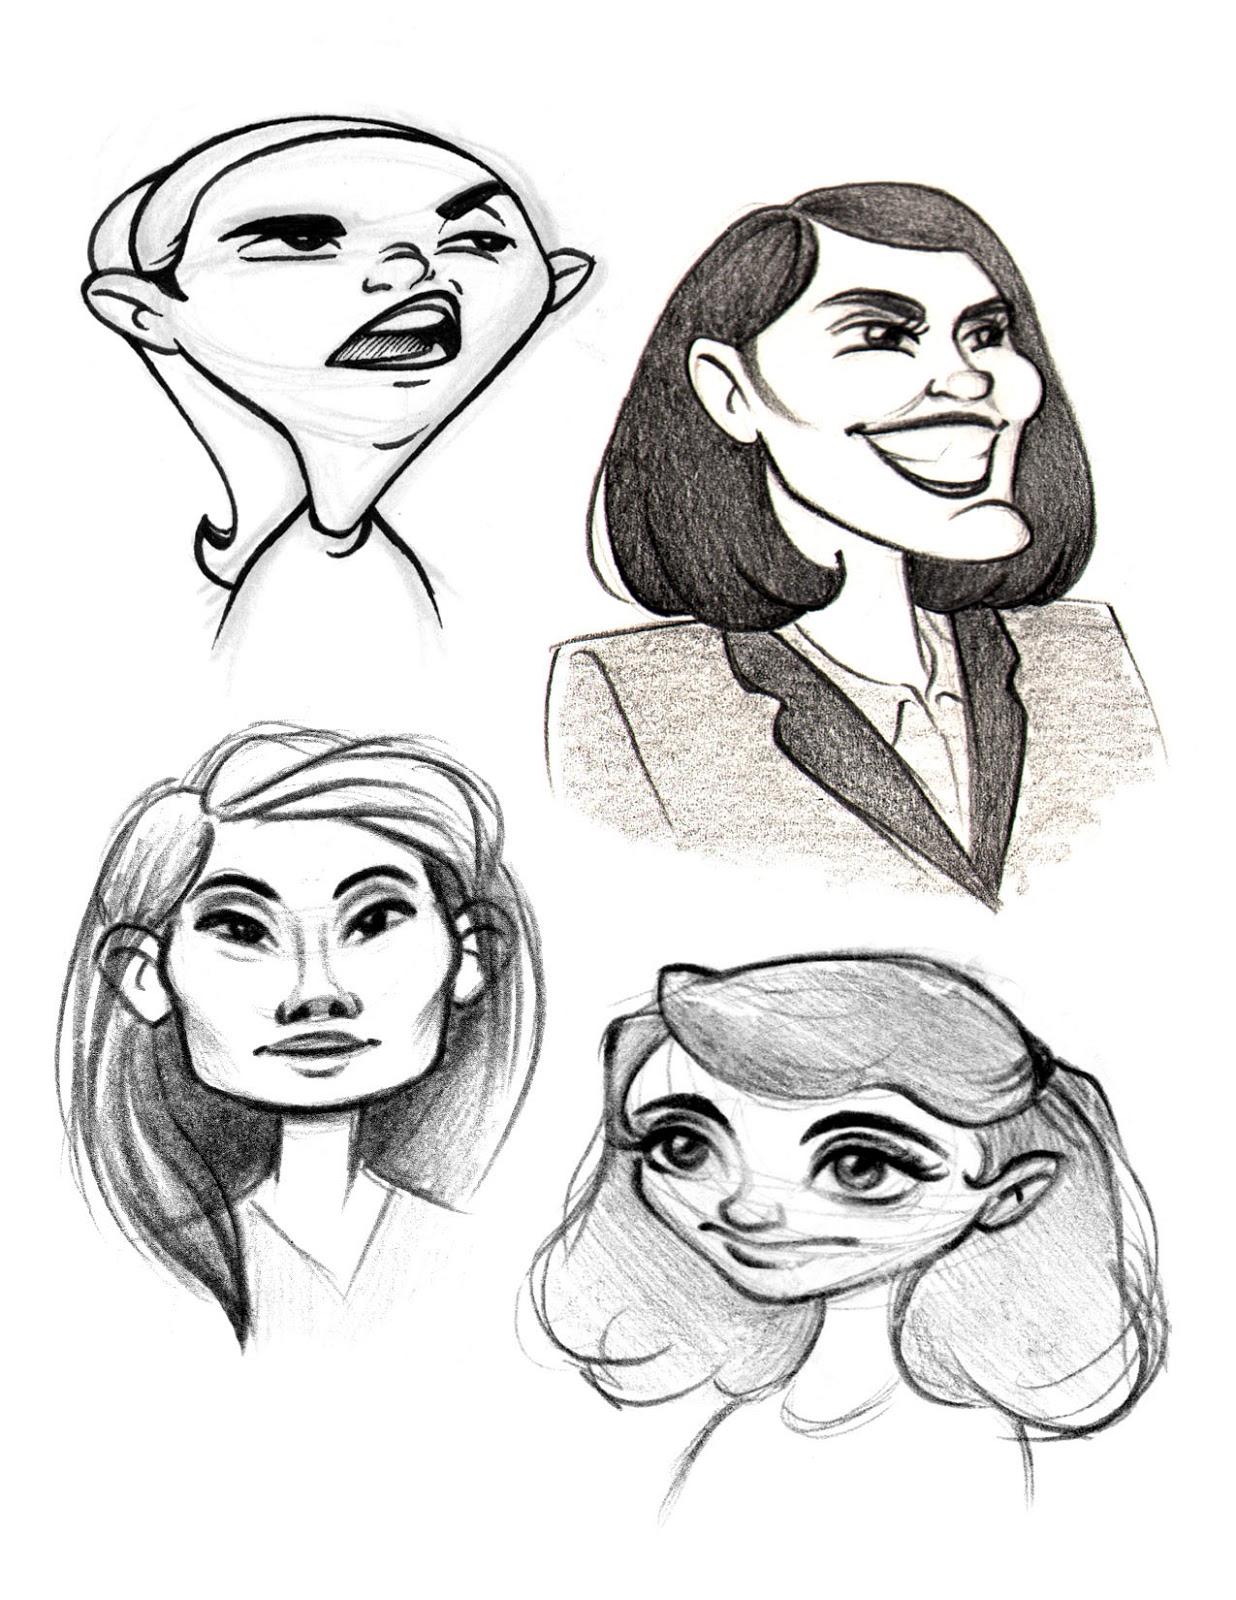 Art of Rebecca De Girolamo: Second Year Caricature Portfolio